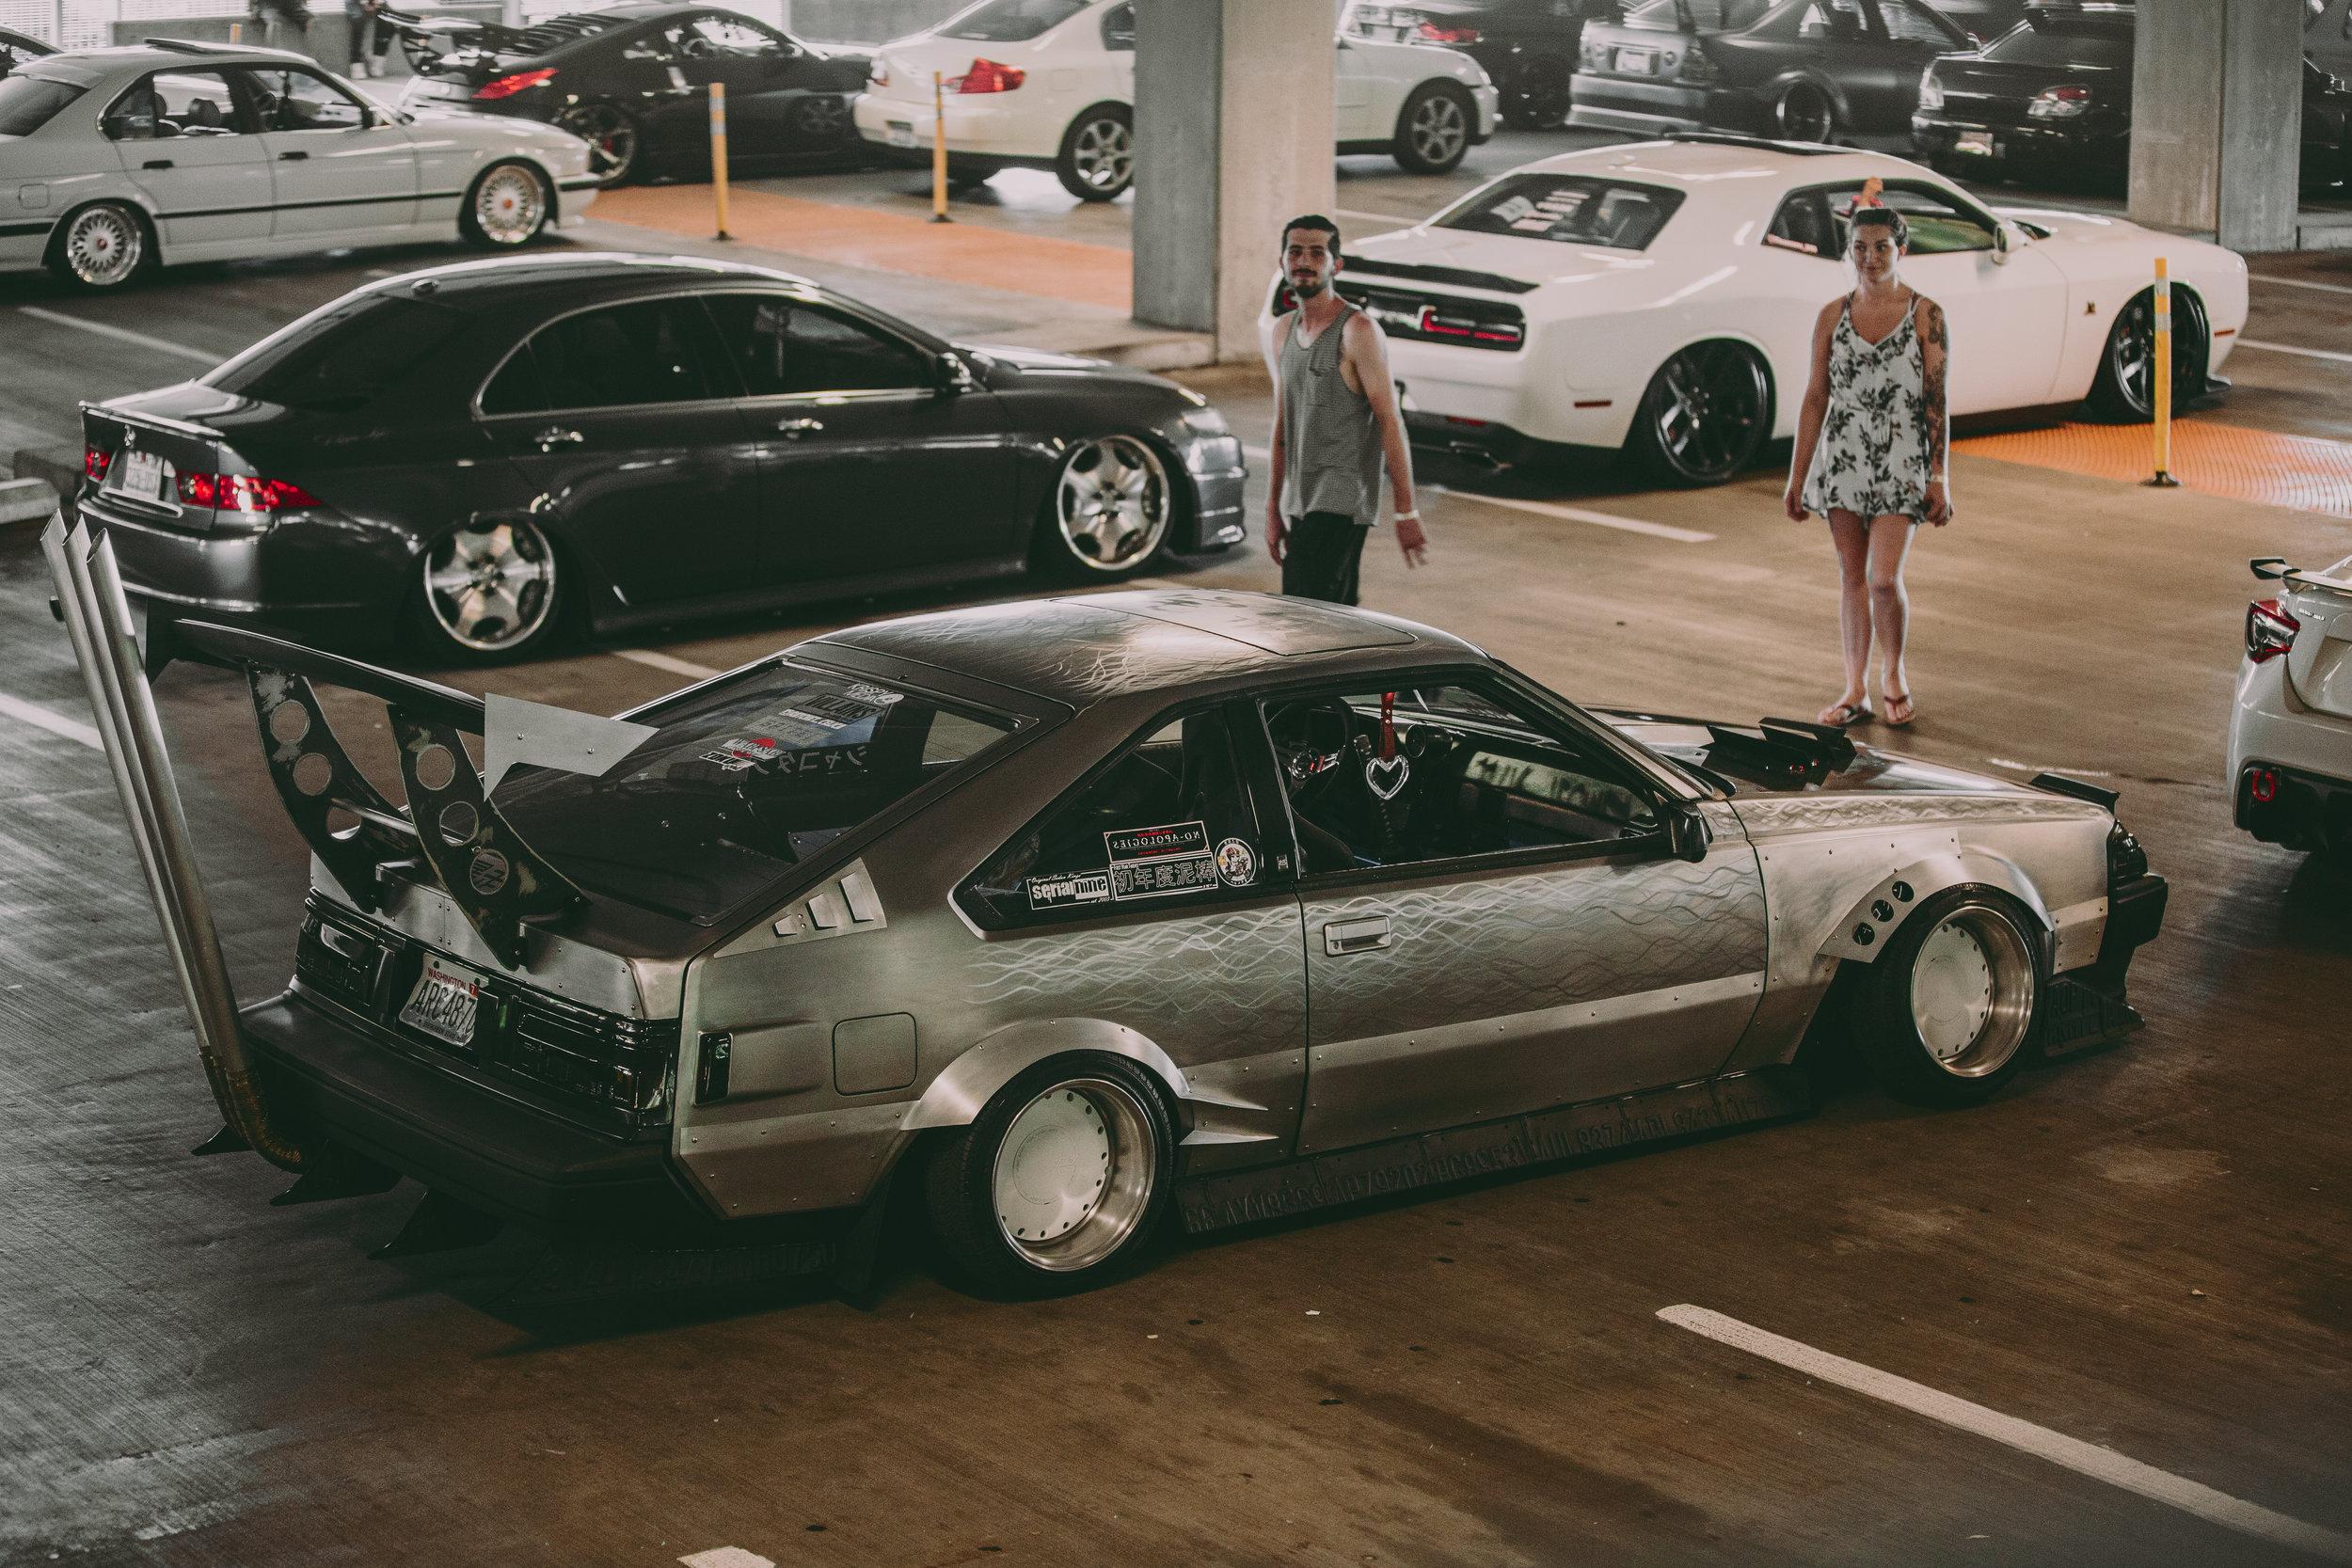 Hawaii photographer, Lifestyle photography, genkimedia, Genkiphotos, Hawaii Automotive photography, Oahu photographer, Hawaii event photography, Cars, Stancewars